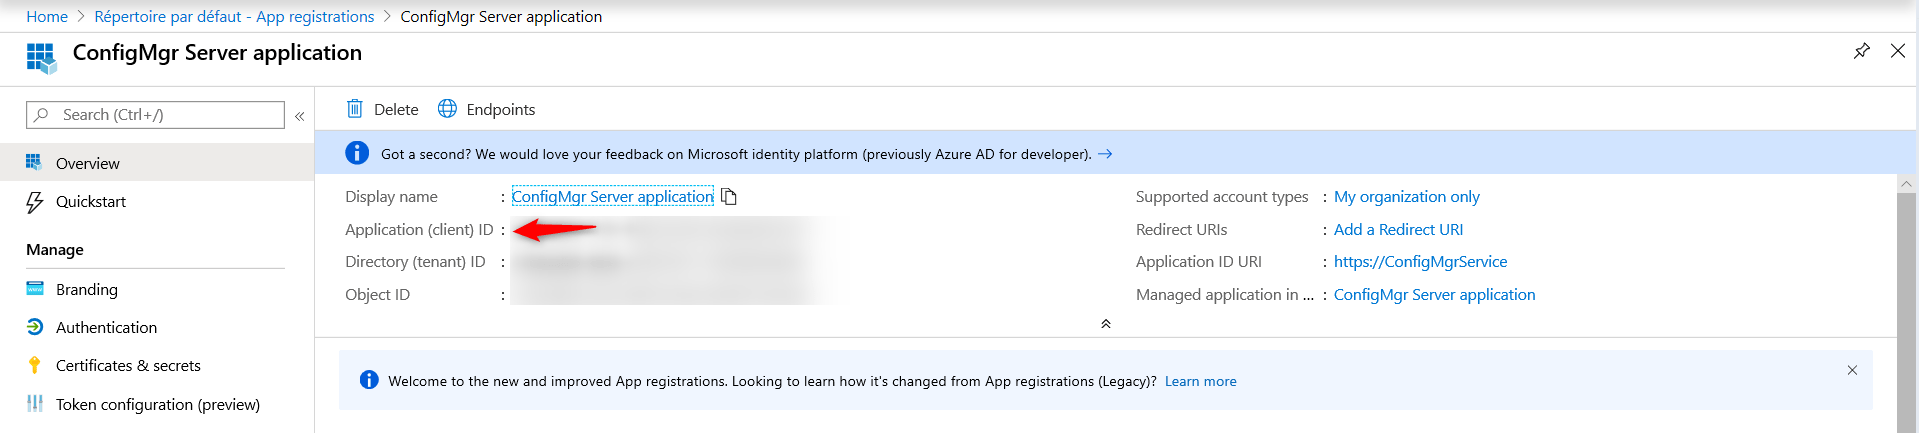 Copy Application ID